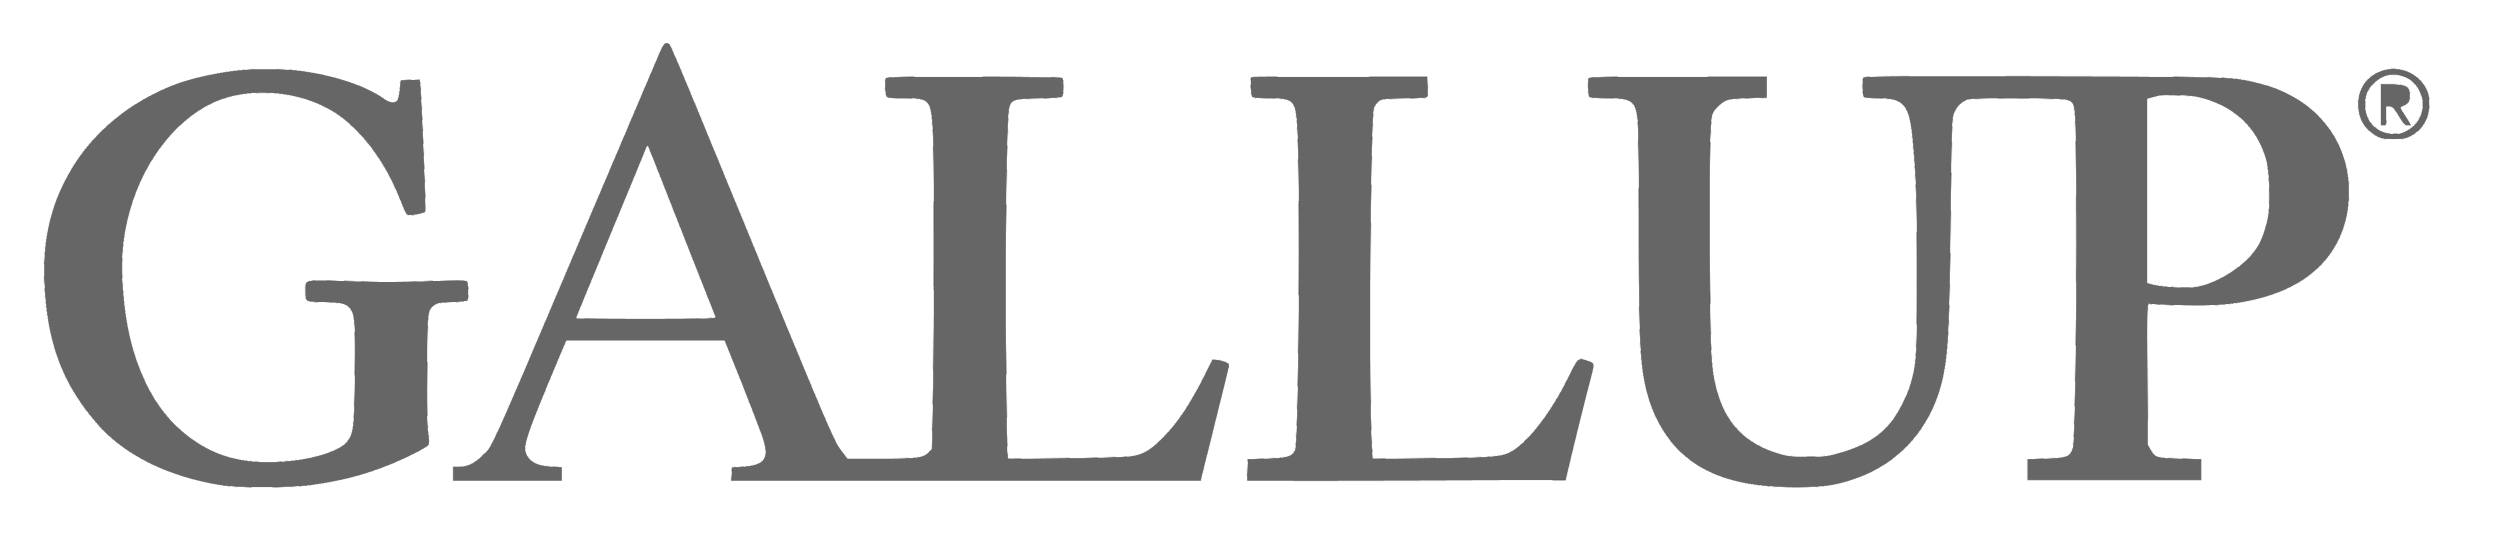 Gallup_logo.png